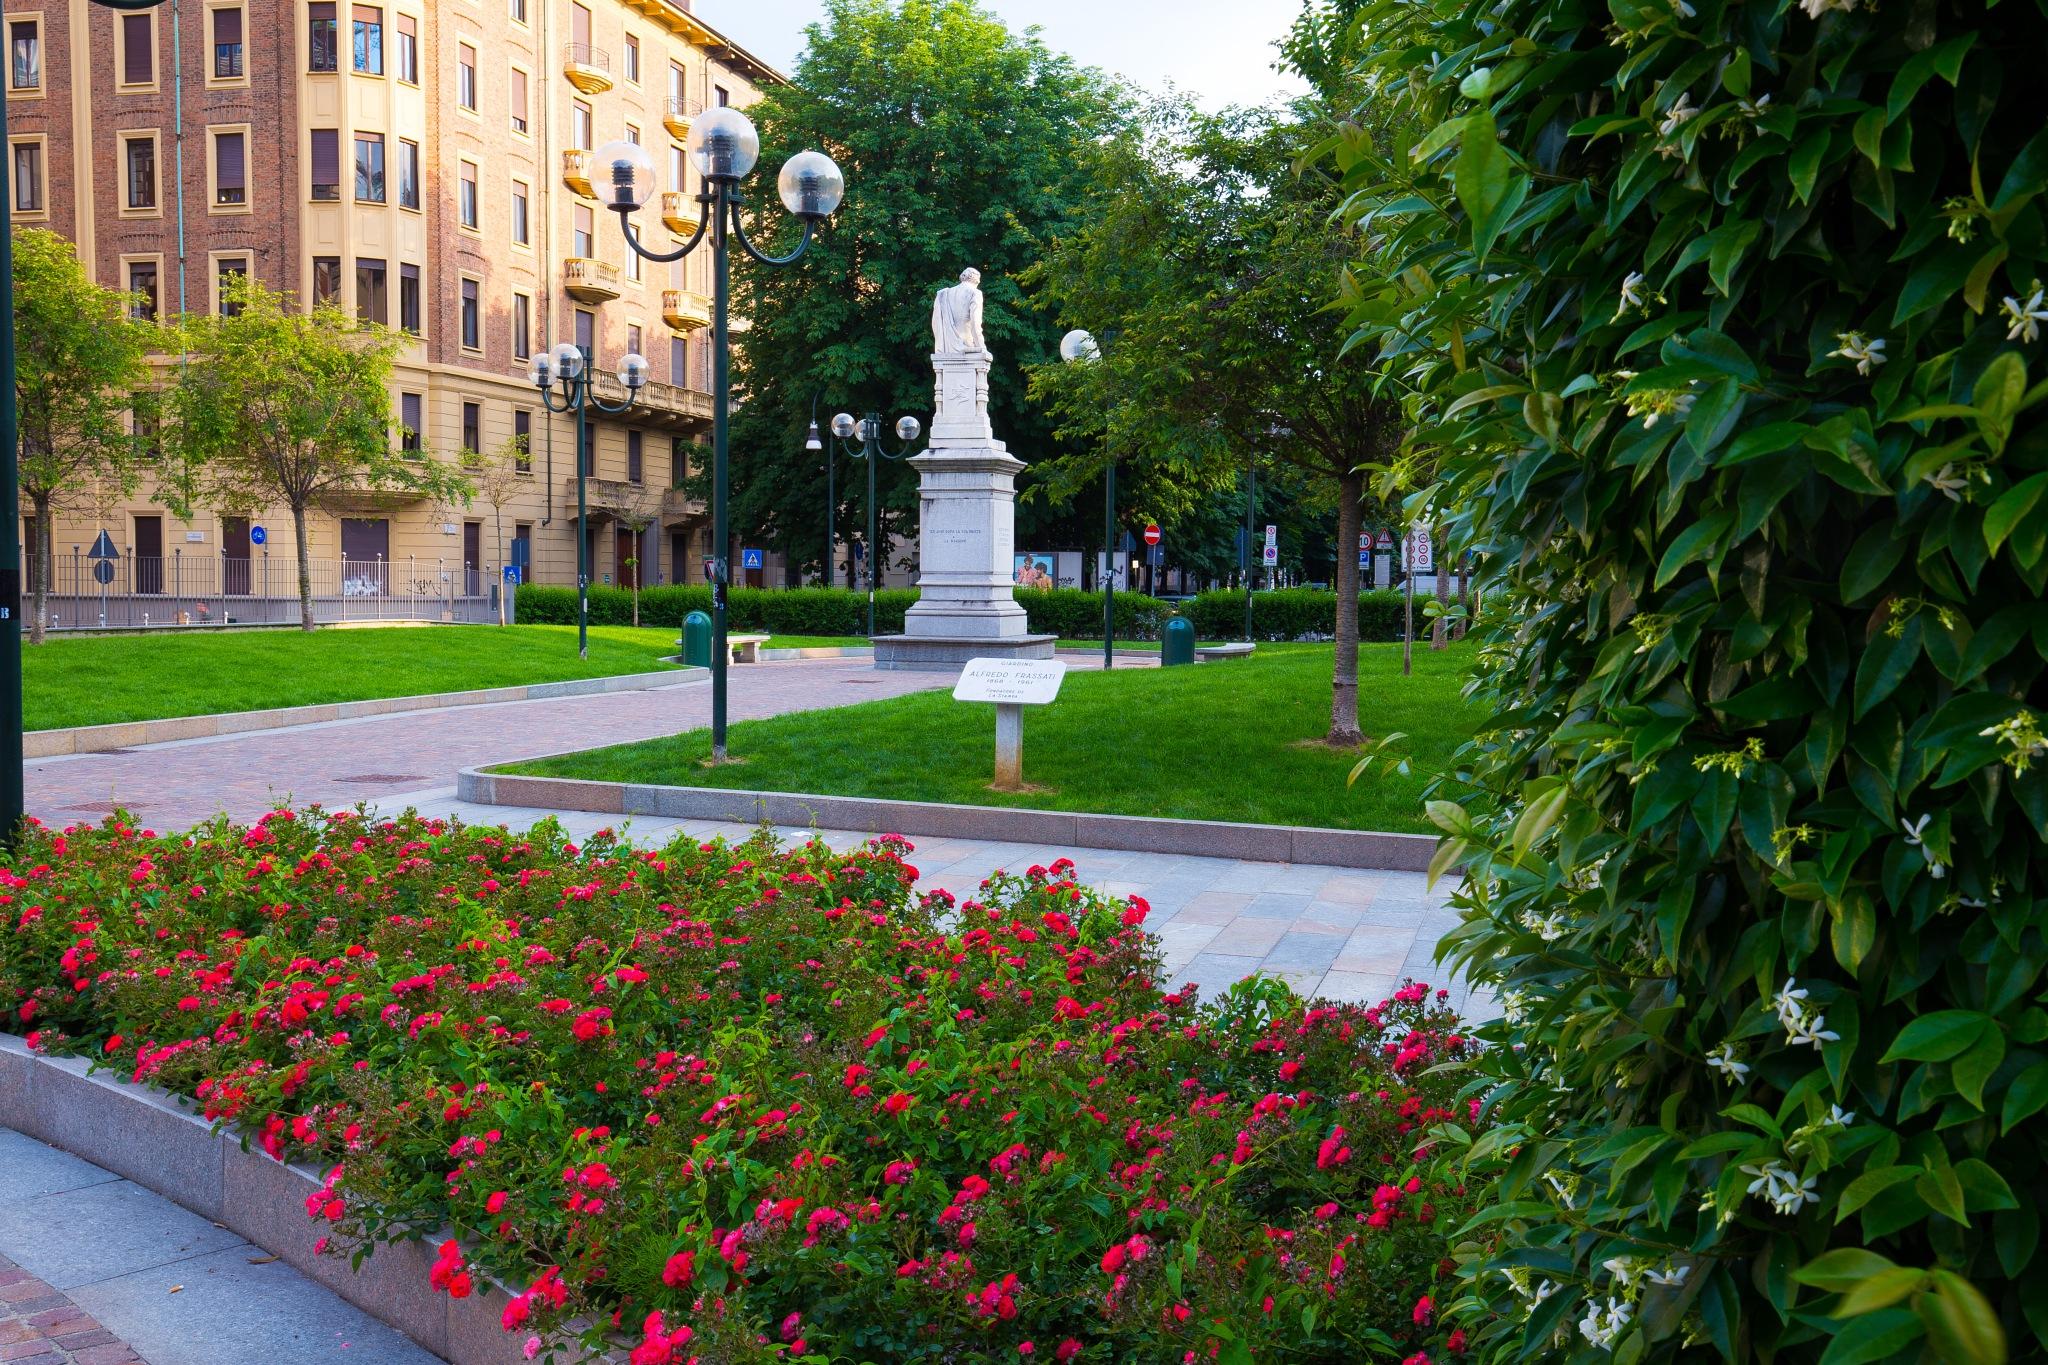 City Garden by petri.fabrizio